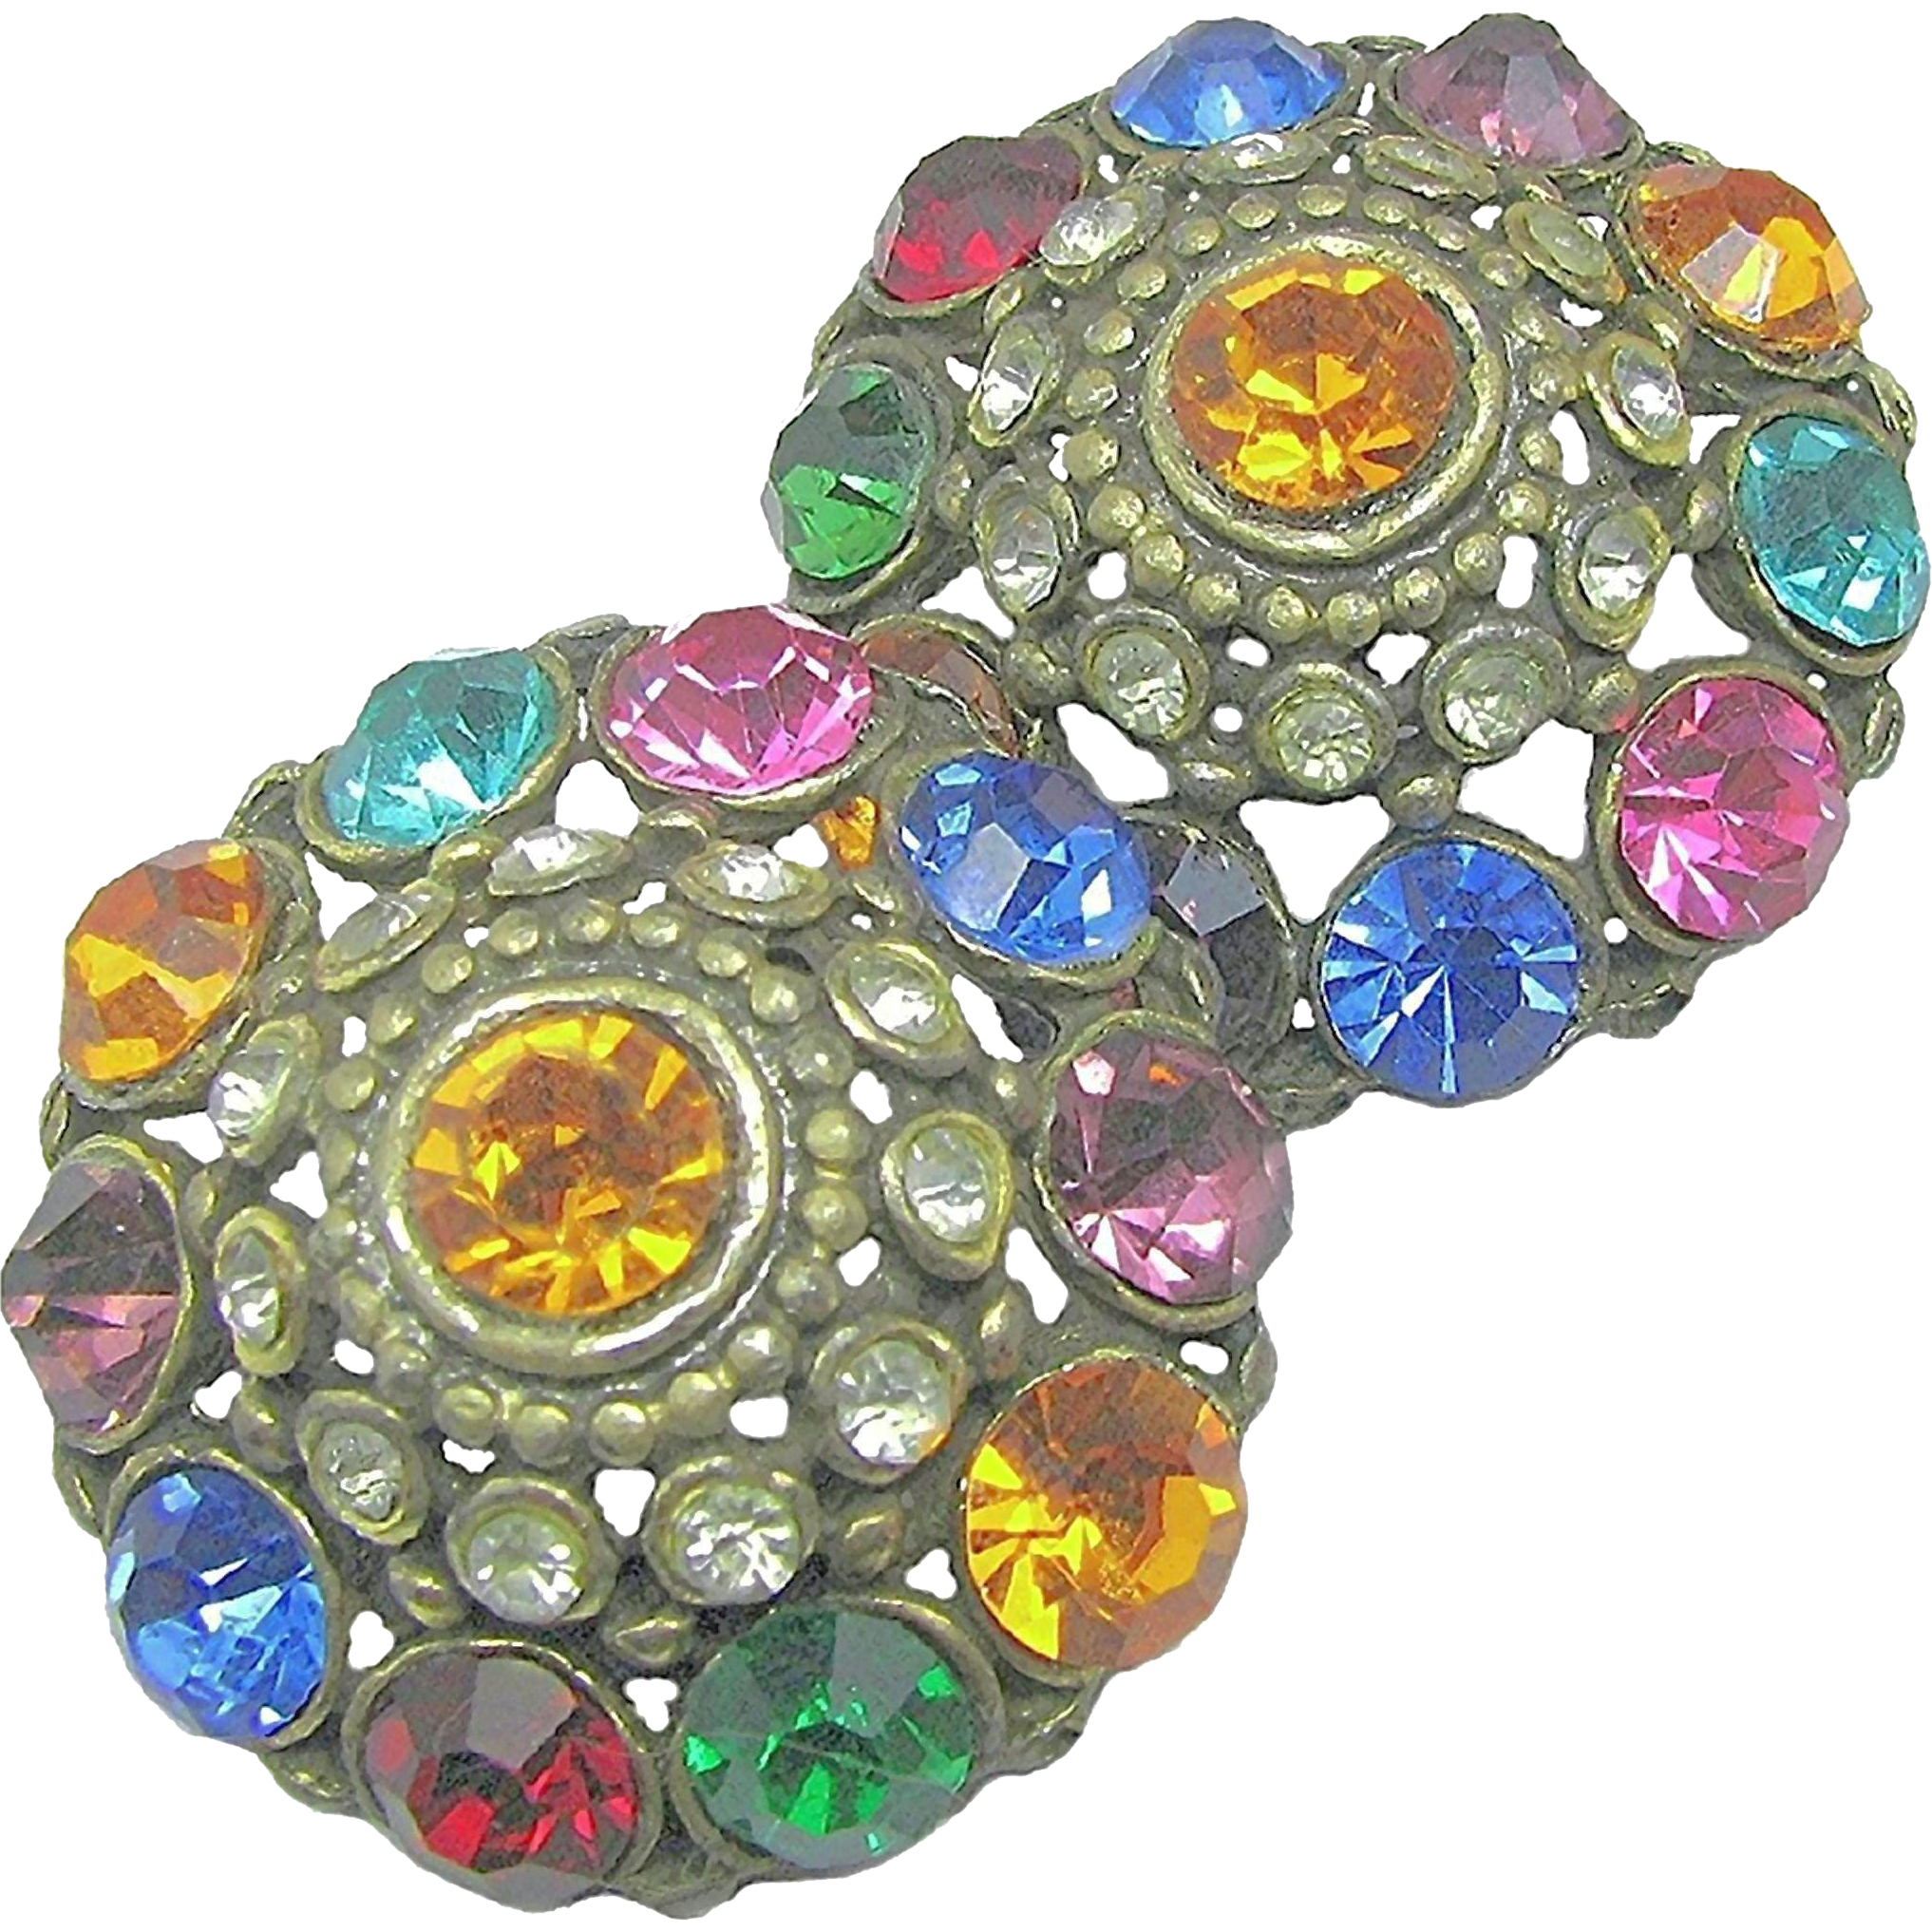 Flashy Art Deco Jewel-Tone Rhinestone Earrings w/ Patent 1967965 Clips c.1934